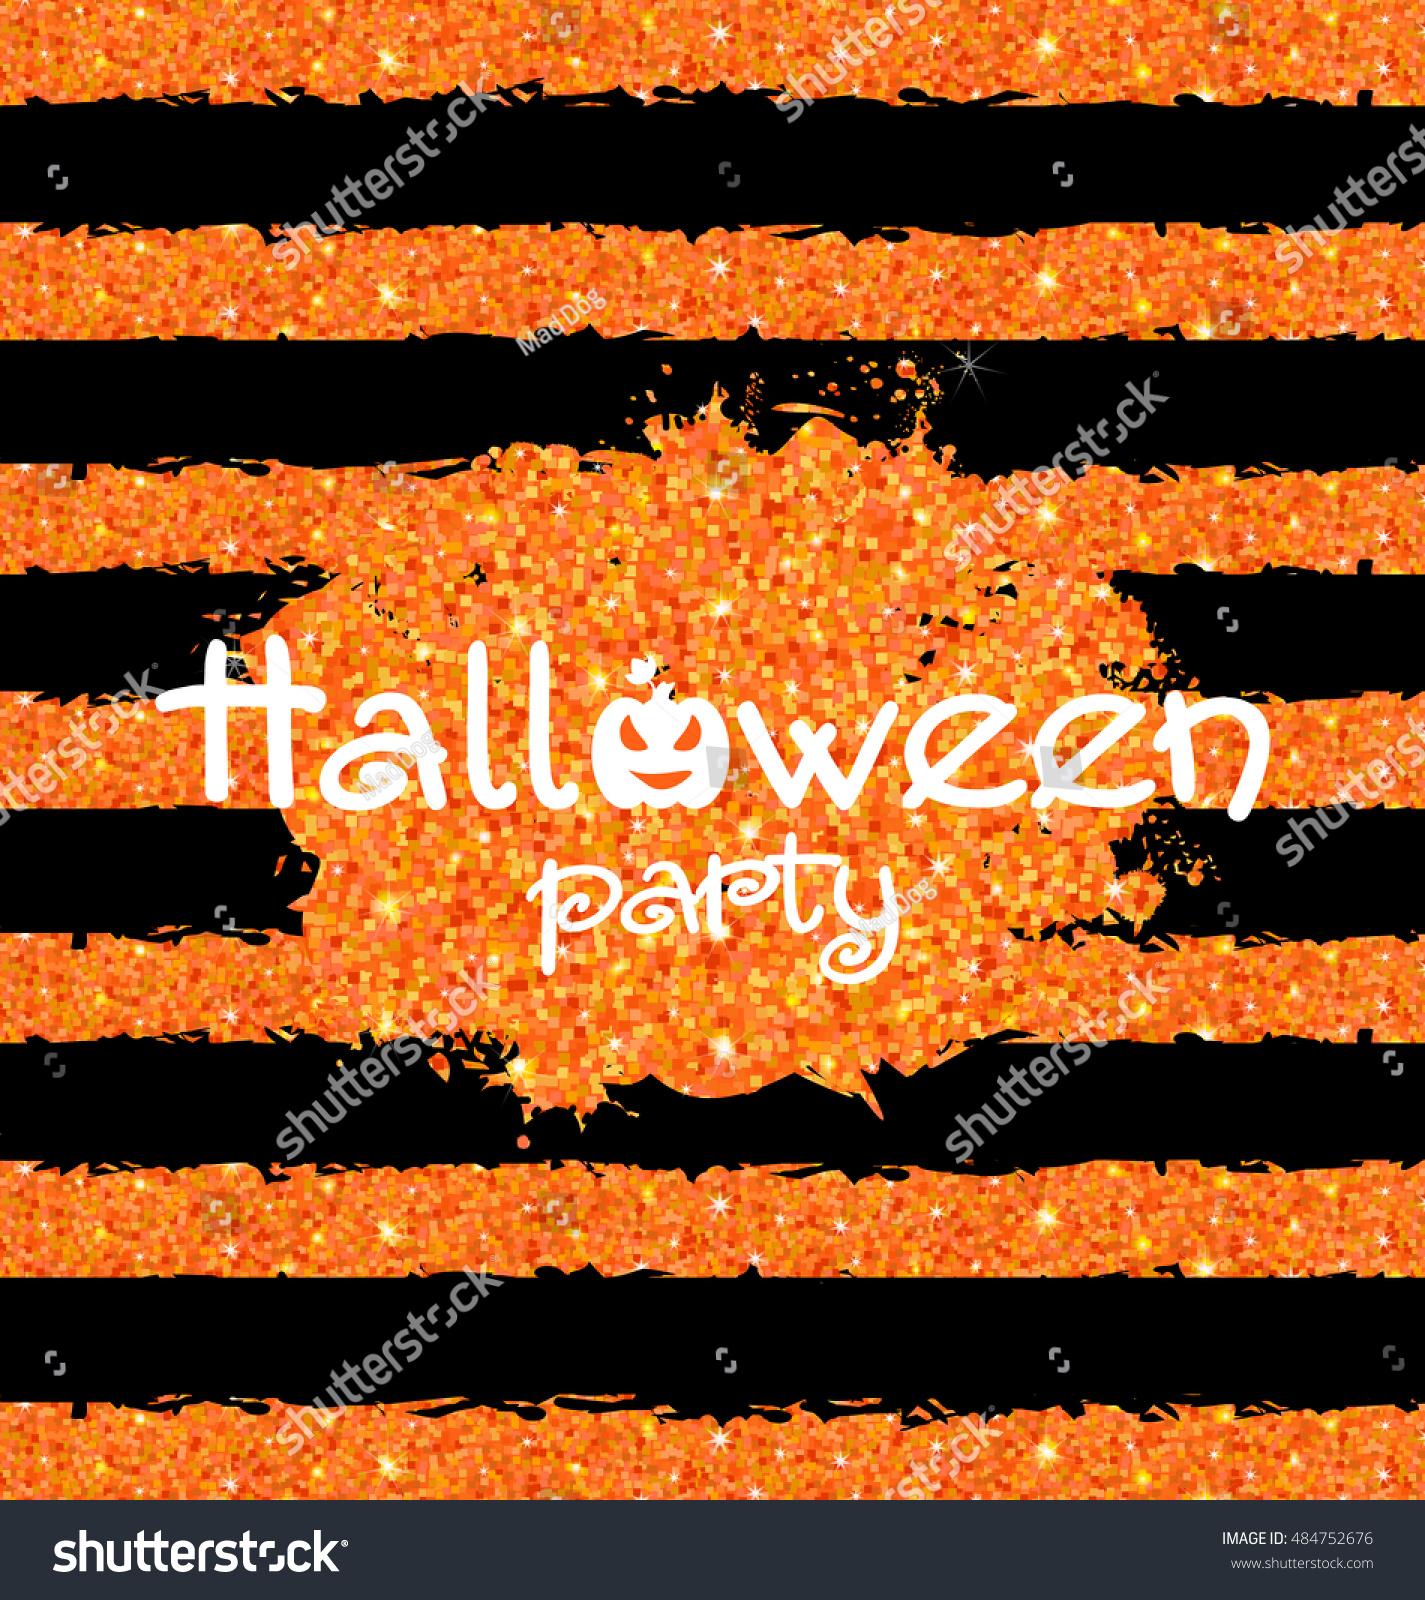 100 halloween certificate template halloween party desserts halloween certificate template illustration shine orange wallpaper happy halloween stock vector yadclub Choice Image